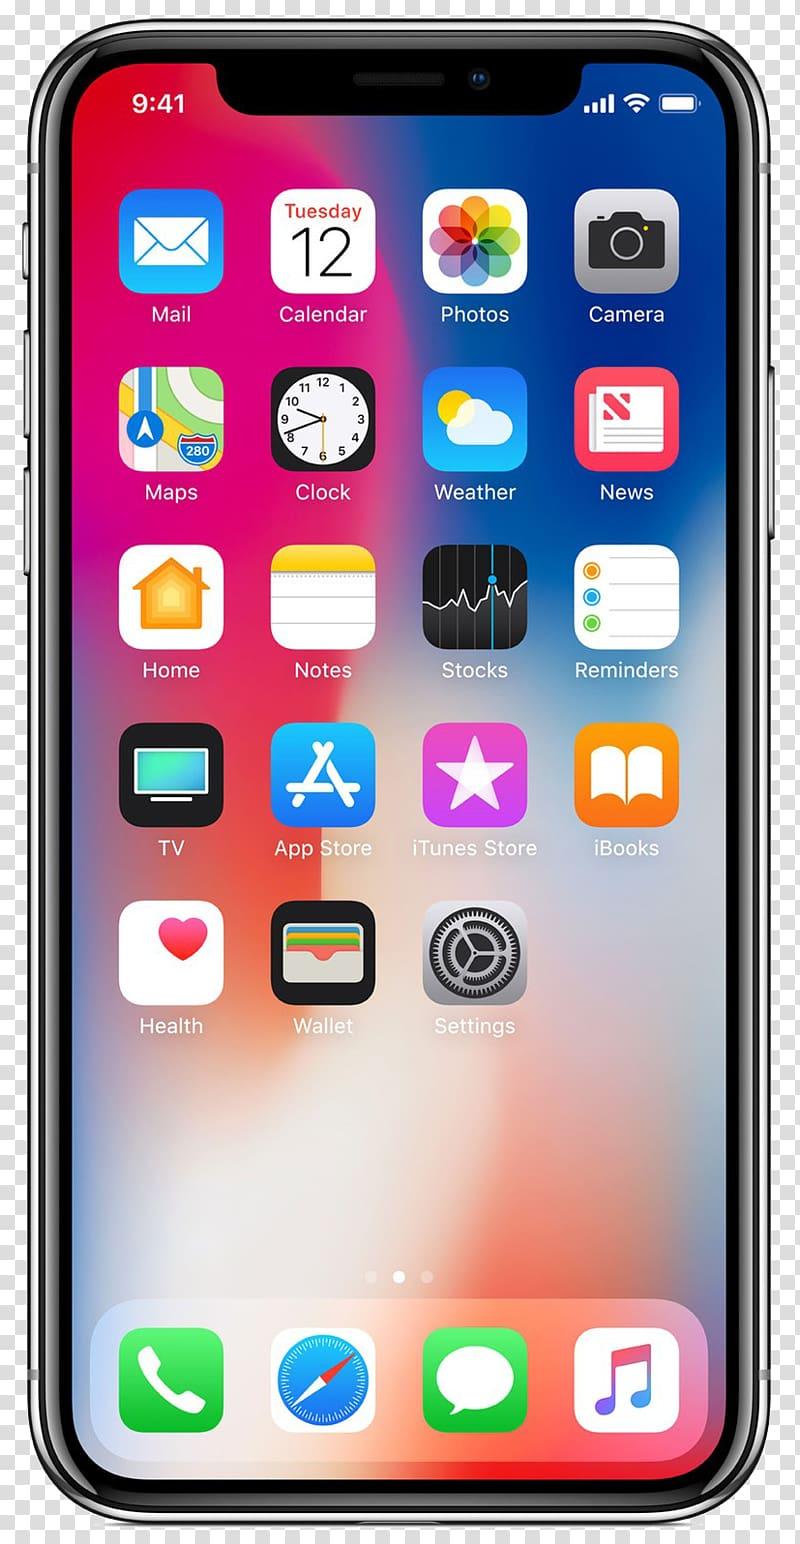 Iphone x logo clipart free IPhone X IPhone 8 Plus iPhone 7, apple iphone transparent ... free